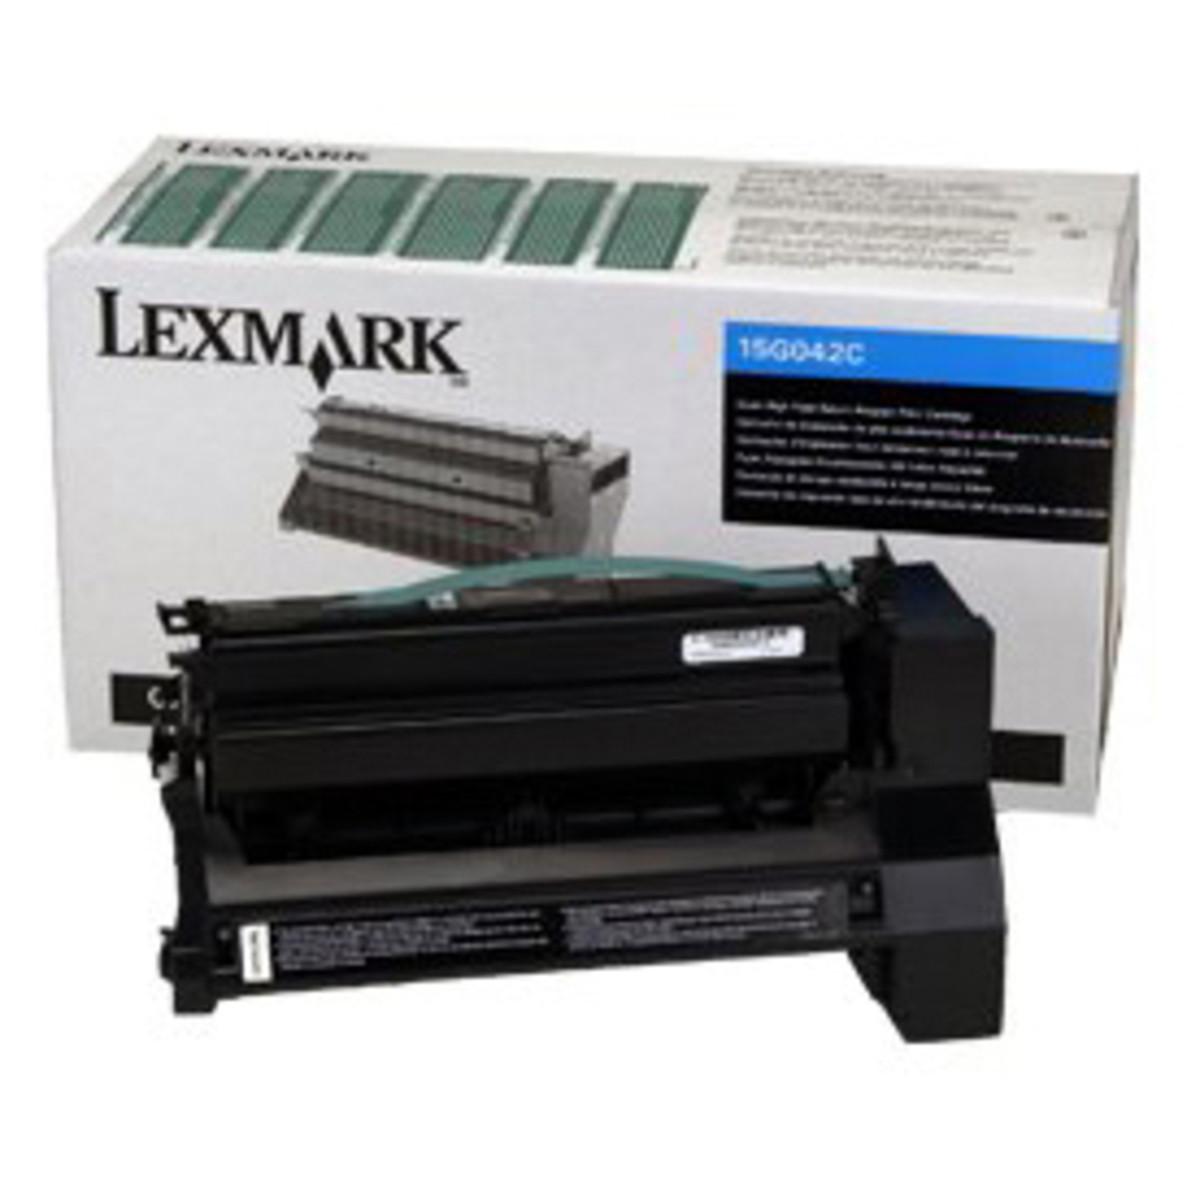 Lemark 15G042C Cyan Toner Cartridge - High Yield